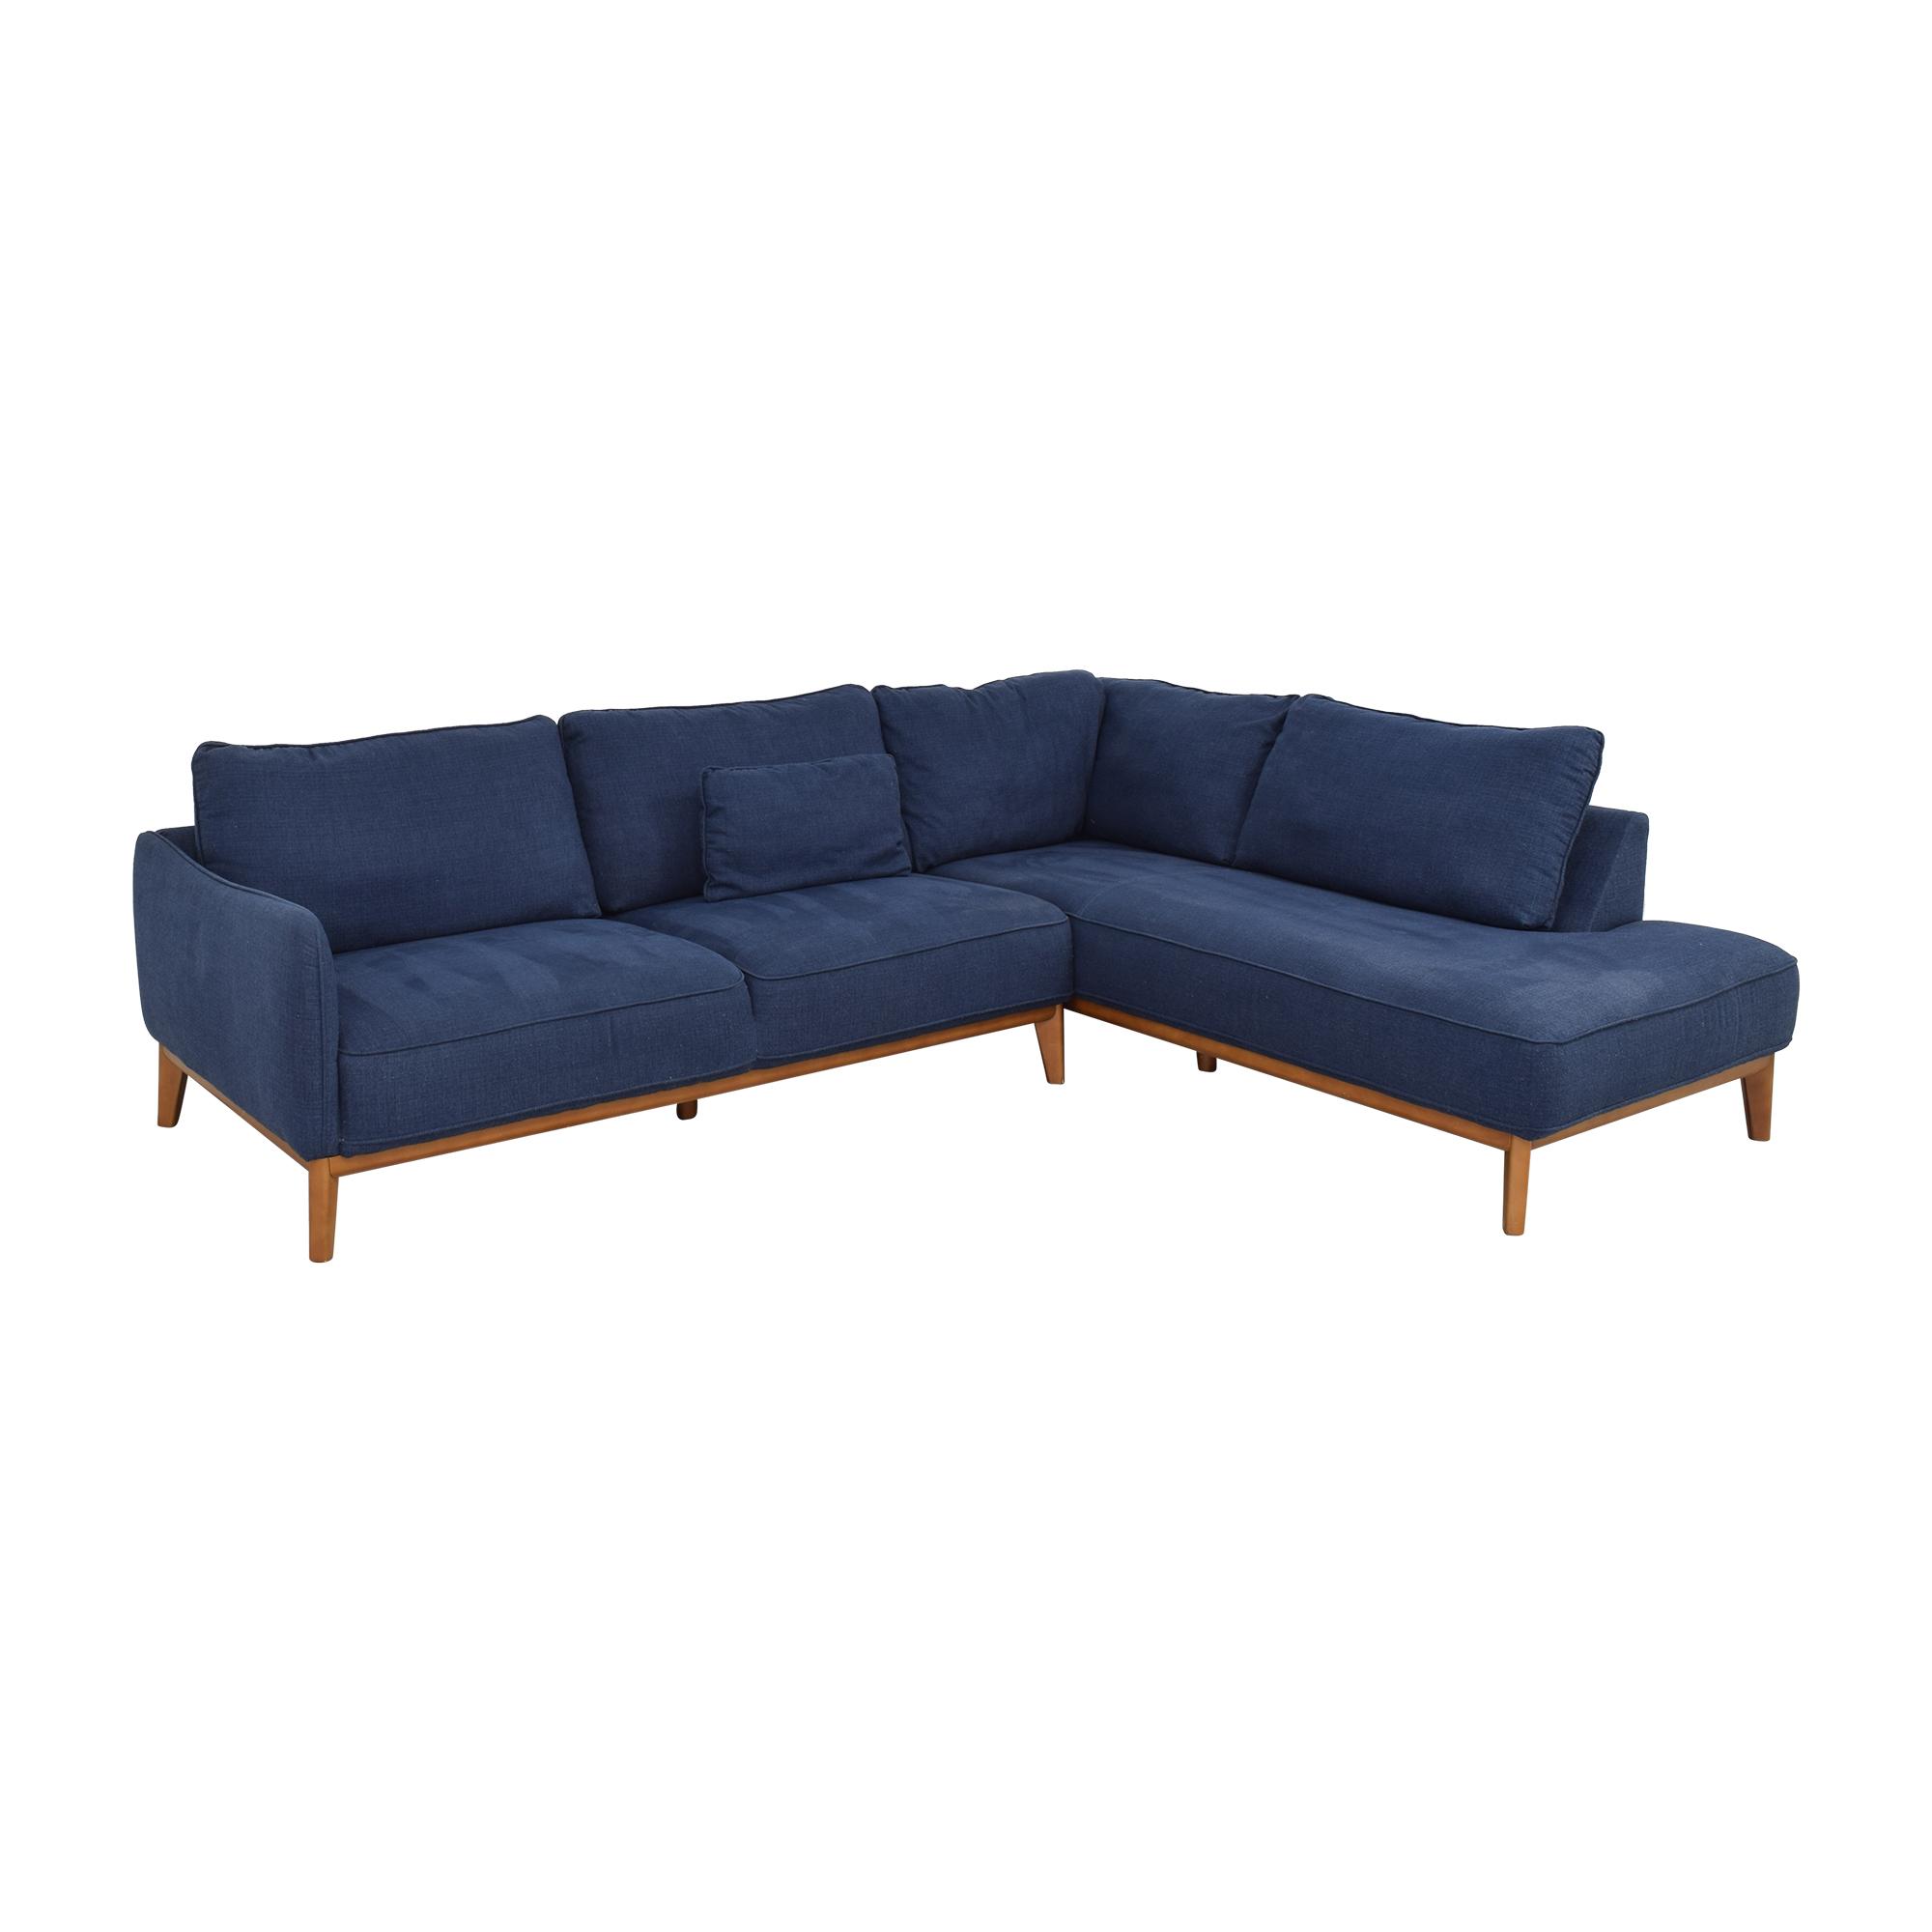 buy Macy's Jollene Sectional Sofa Jason Furniture Sofas